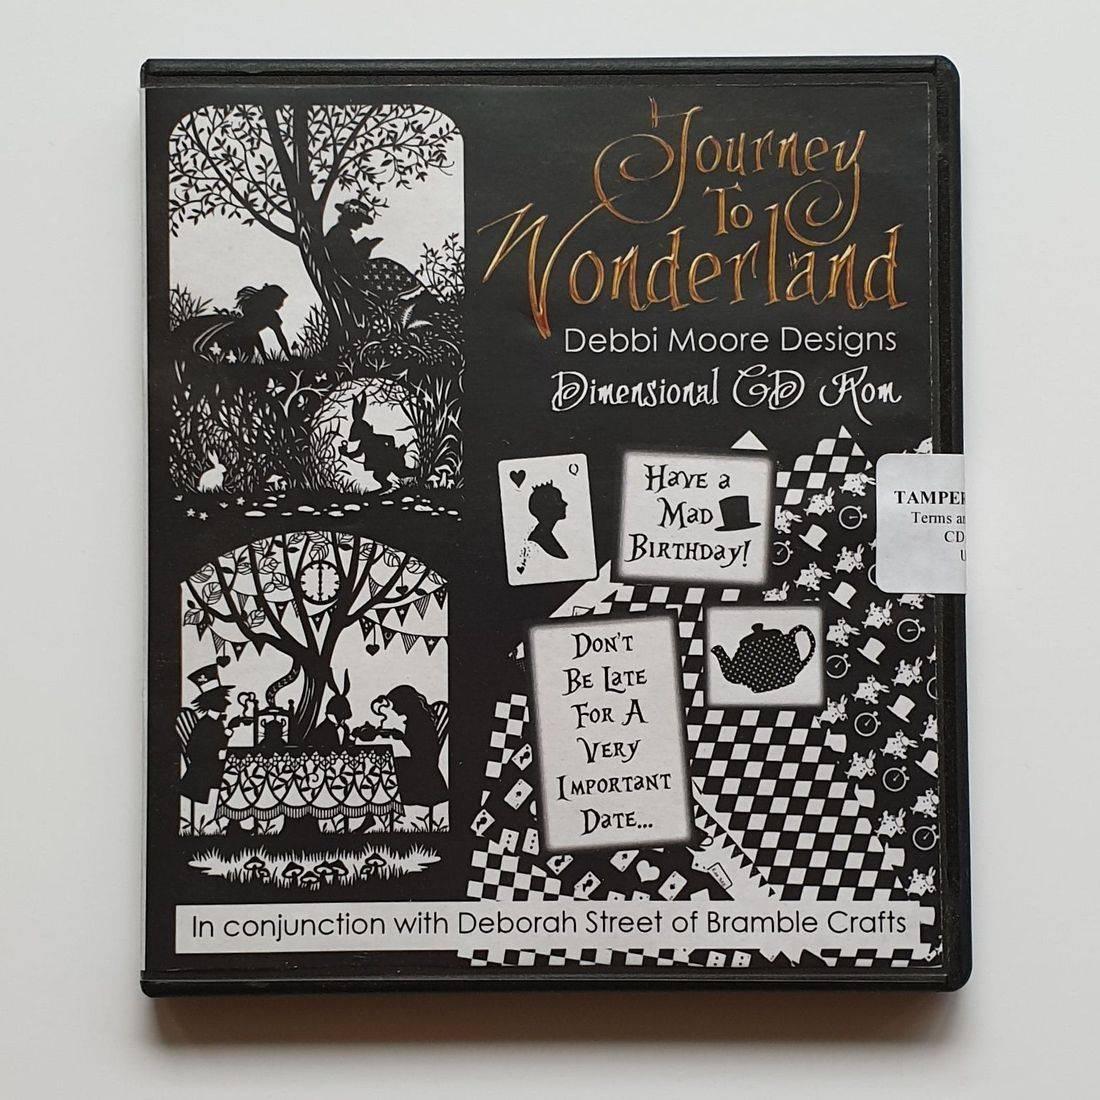 debbi moore, alice in wonderland crafting, papercraft, craft CD, bramble crafts